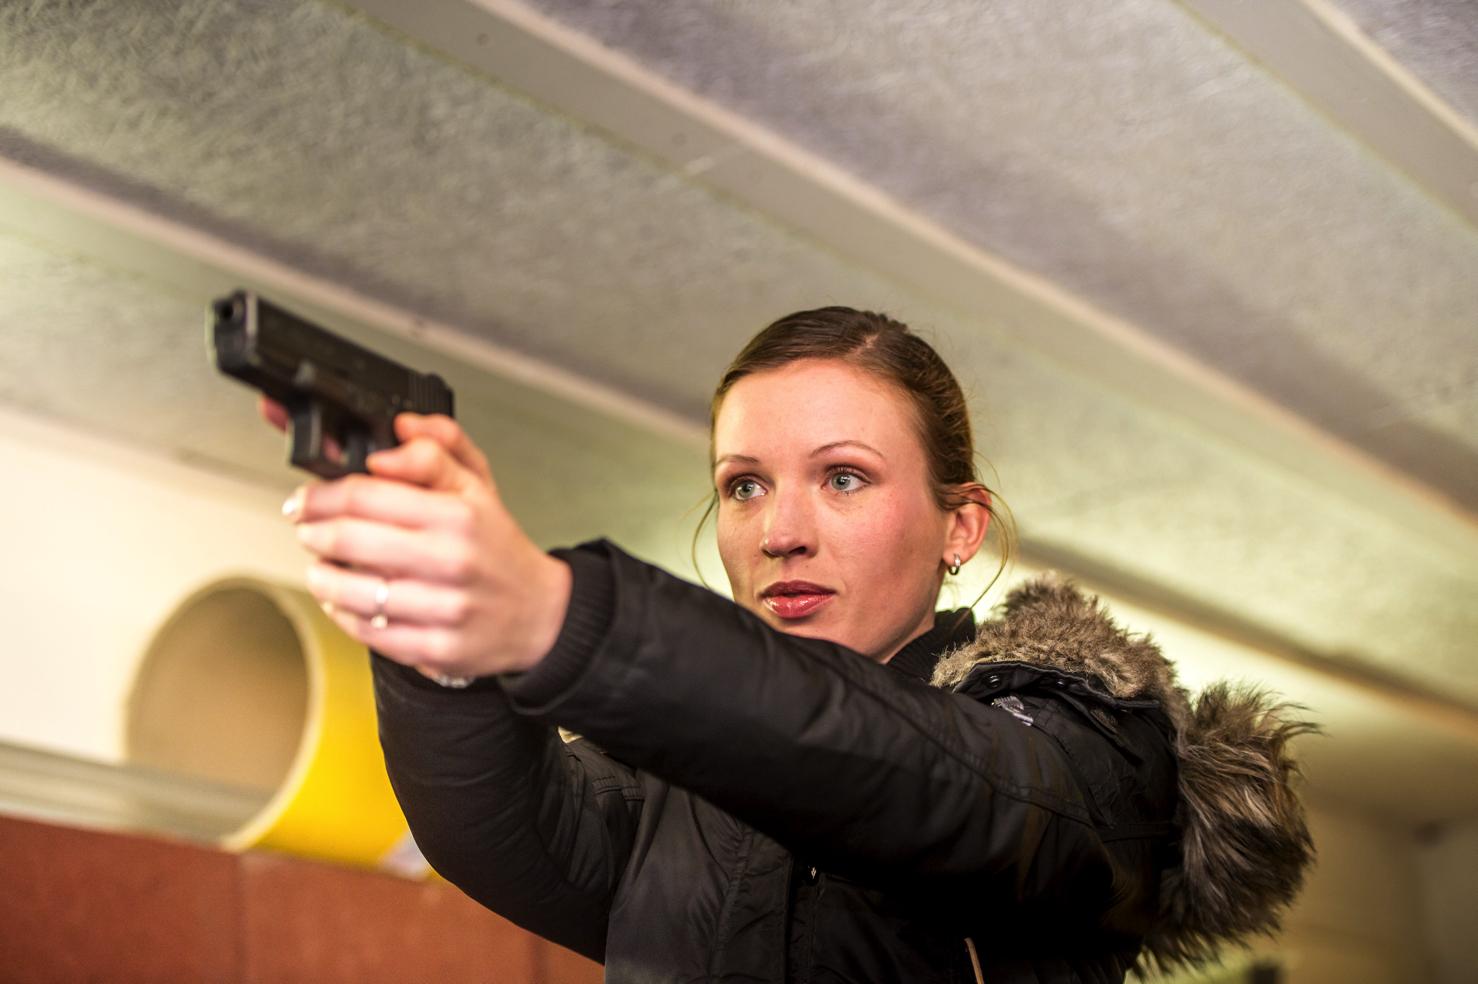 5-bewaffneter-personenschutz